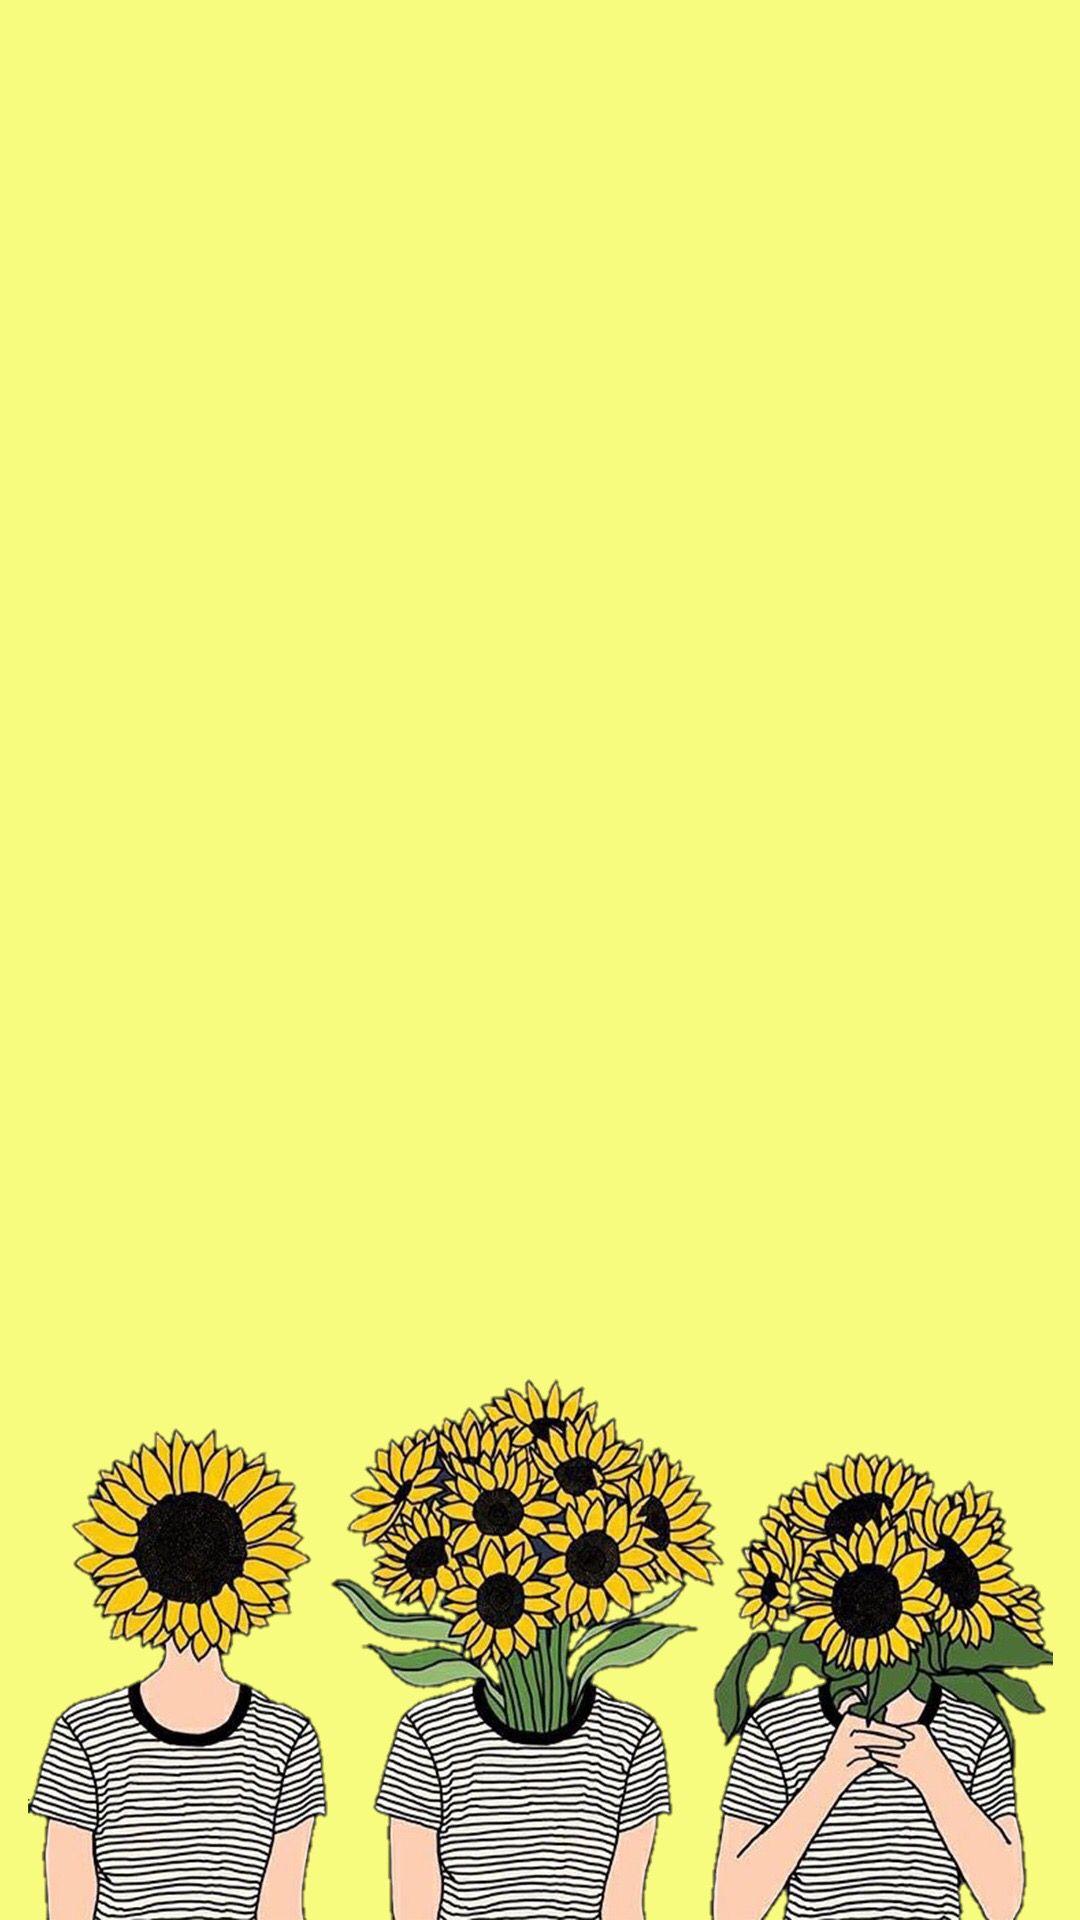 Pin De Caty Medina En Arte En 2020 Girasoles Dibujo Arte De